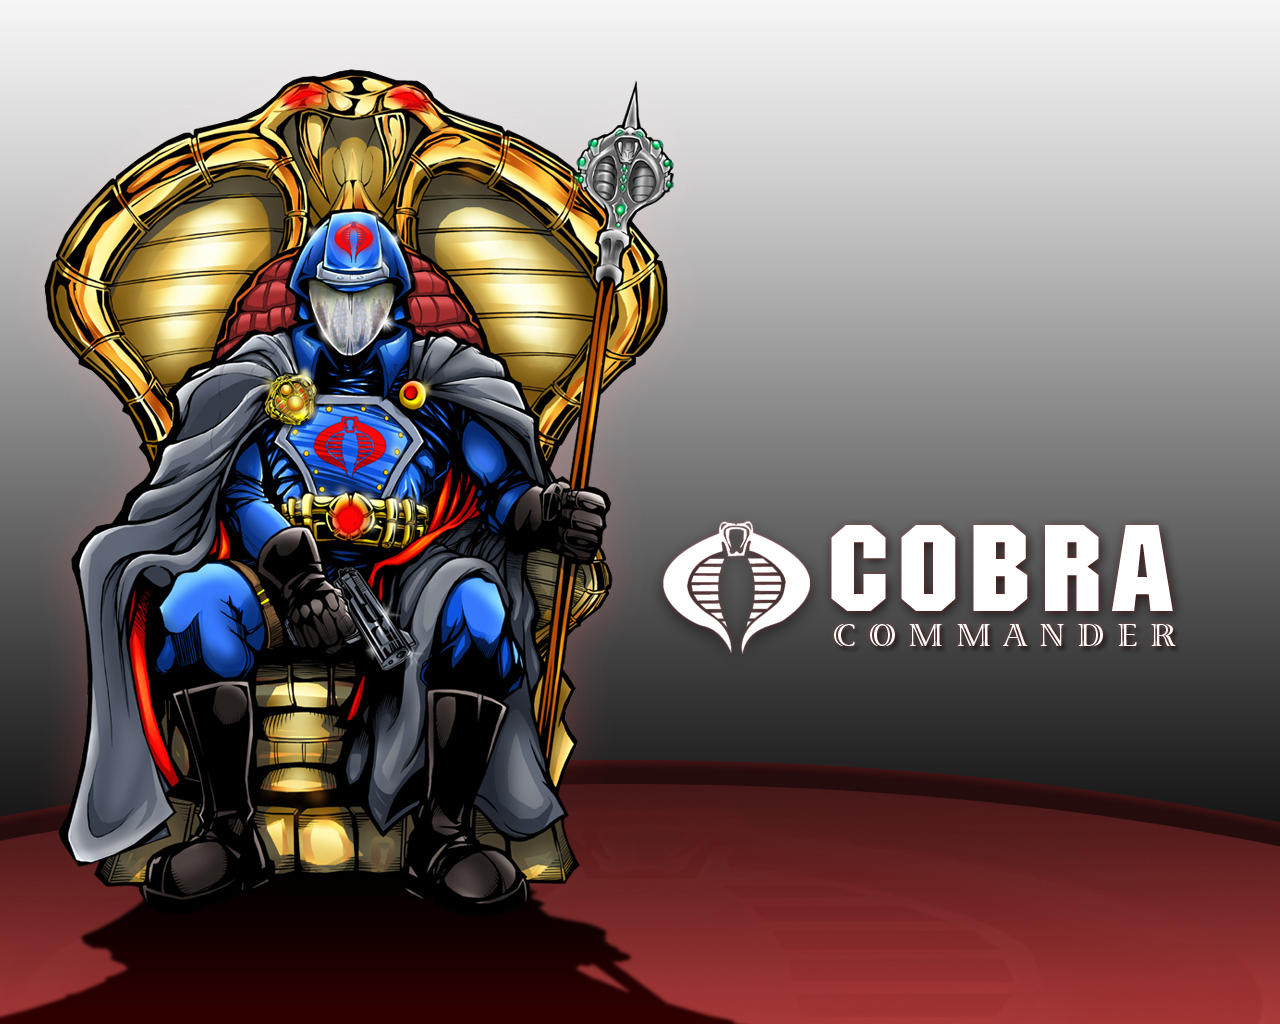 Cobra Commander Wallpaper 2 by RedStarMediaCobra Commander Wallpaper